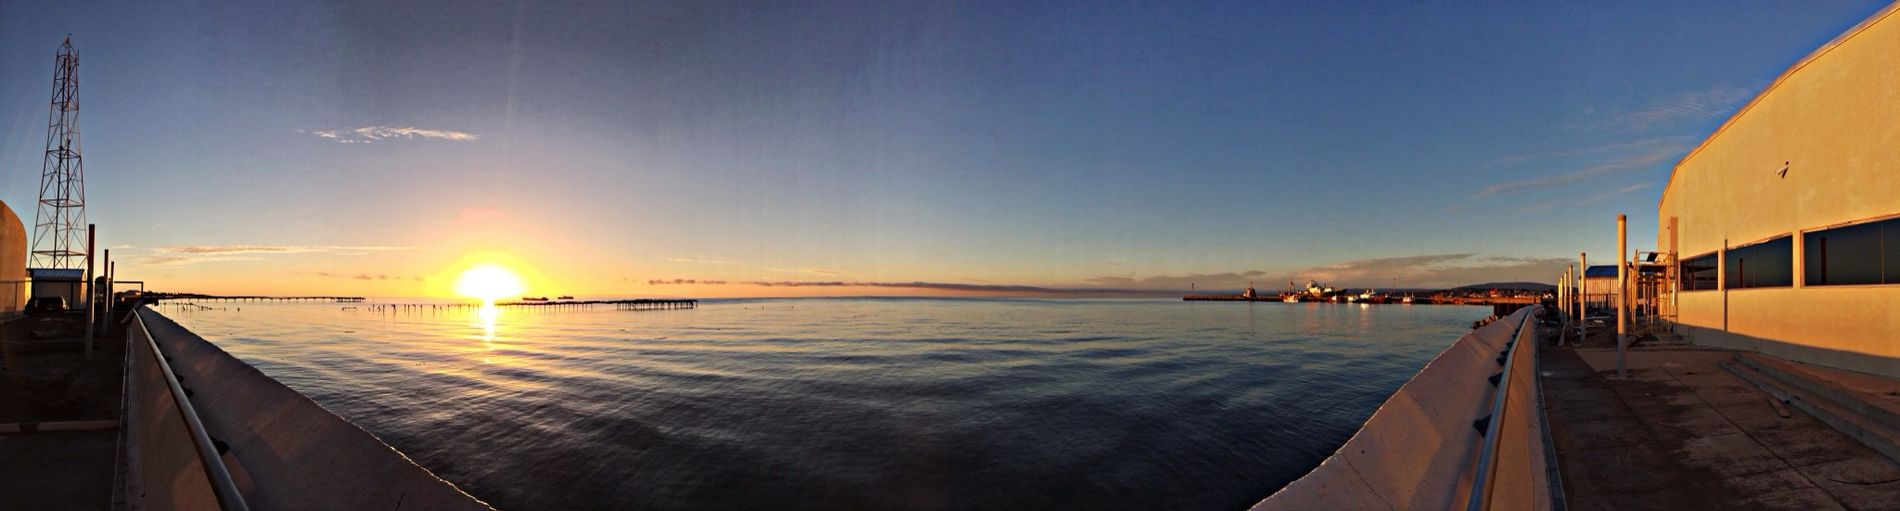 Enjoying The View Sunrise Enjoying The Sun Ocean